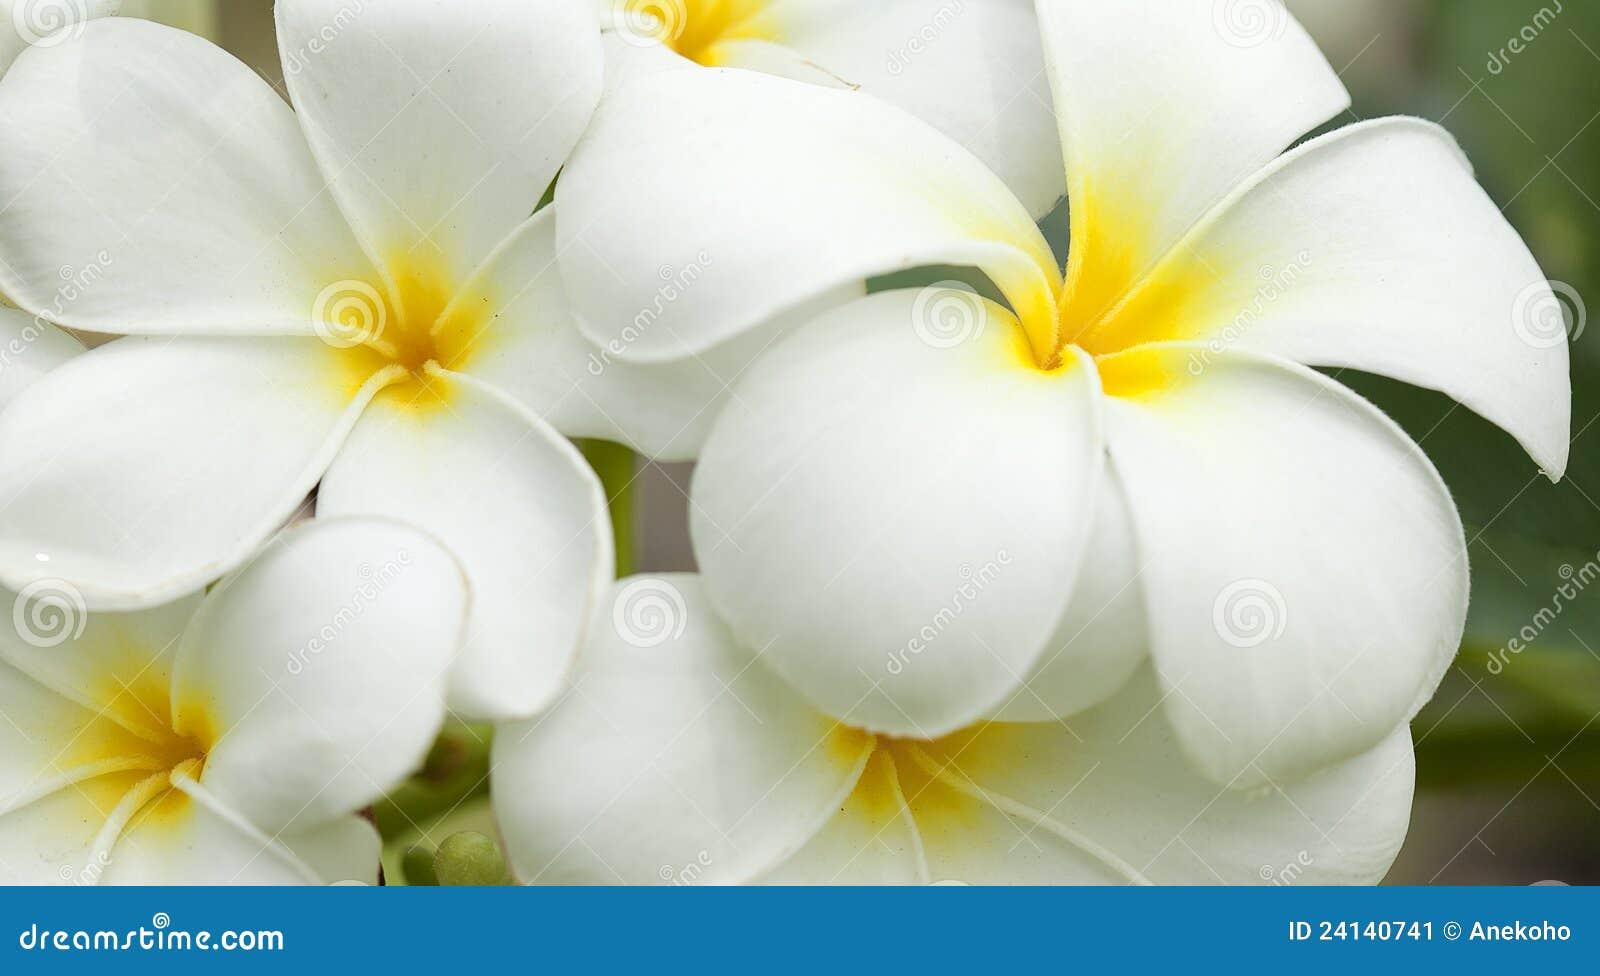 Fiori Bianchi Foto E Nomi.White And Yellow Frangipani Flowers Stock Image Image Of Flora